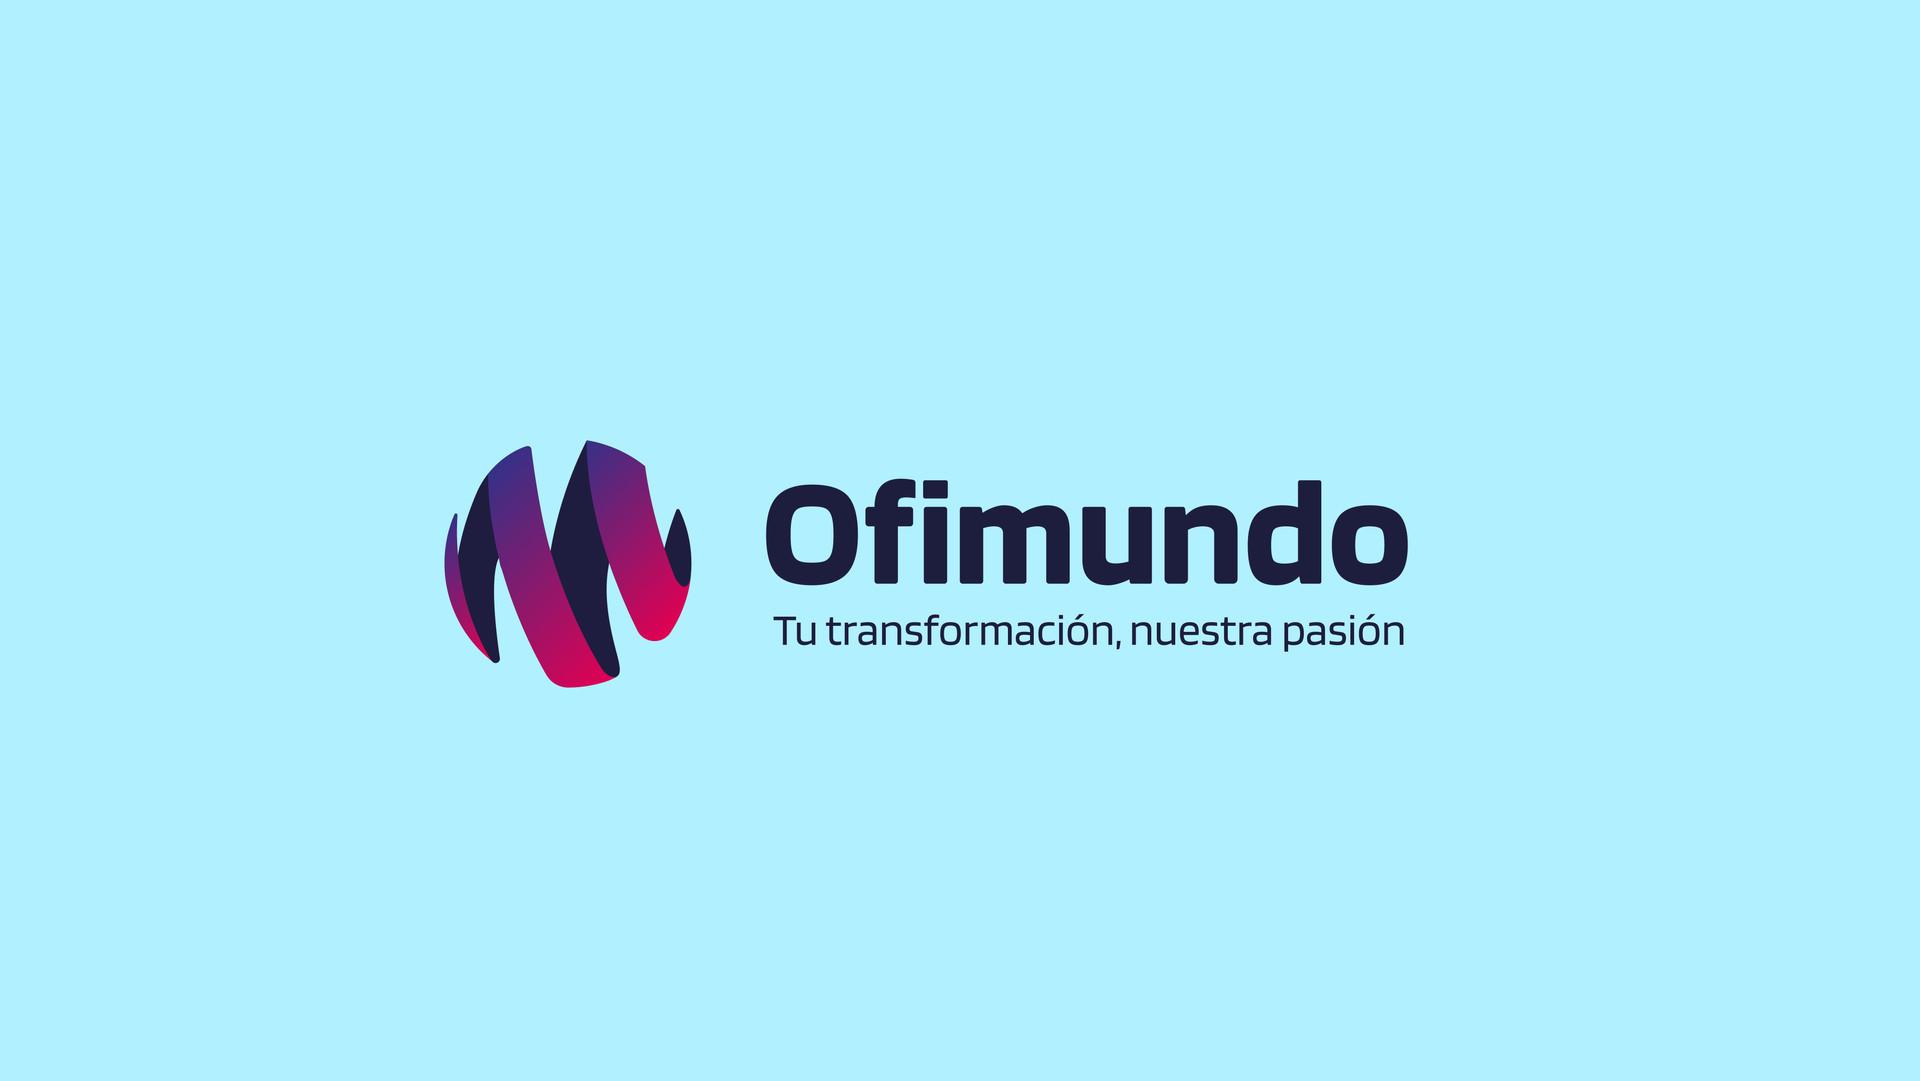 CASO_OFIMUNDO-18.jpg